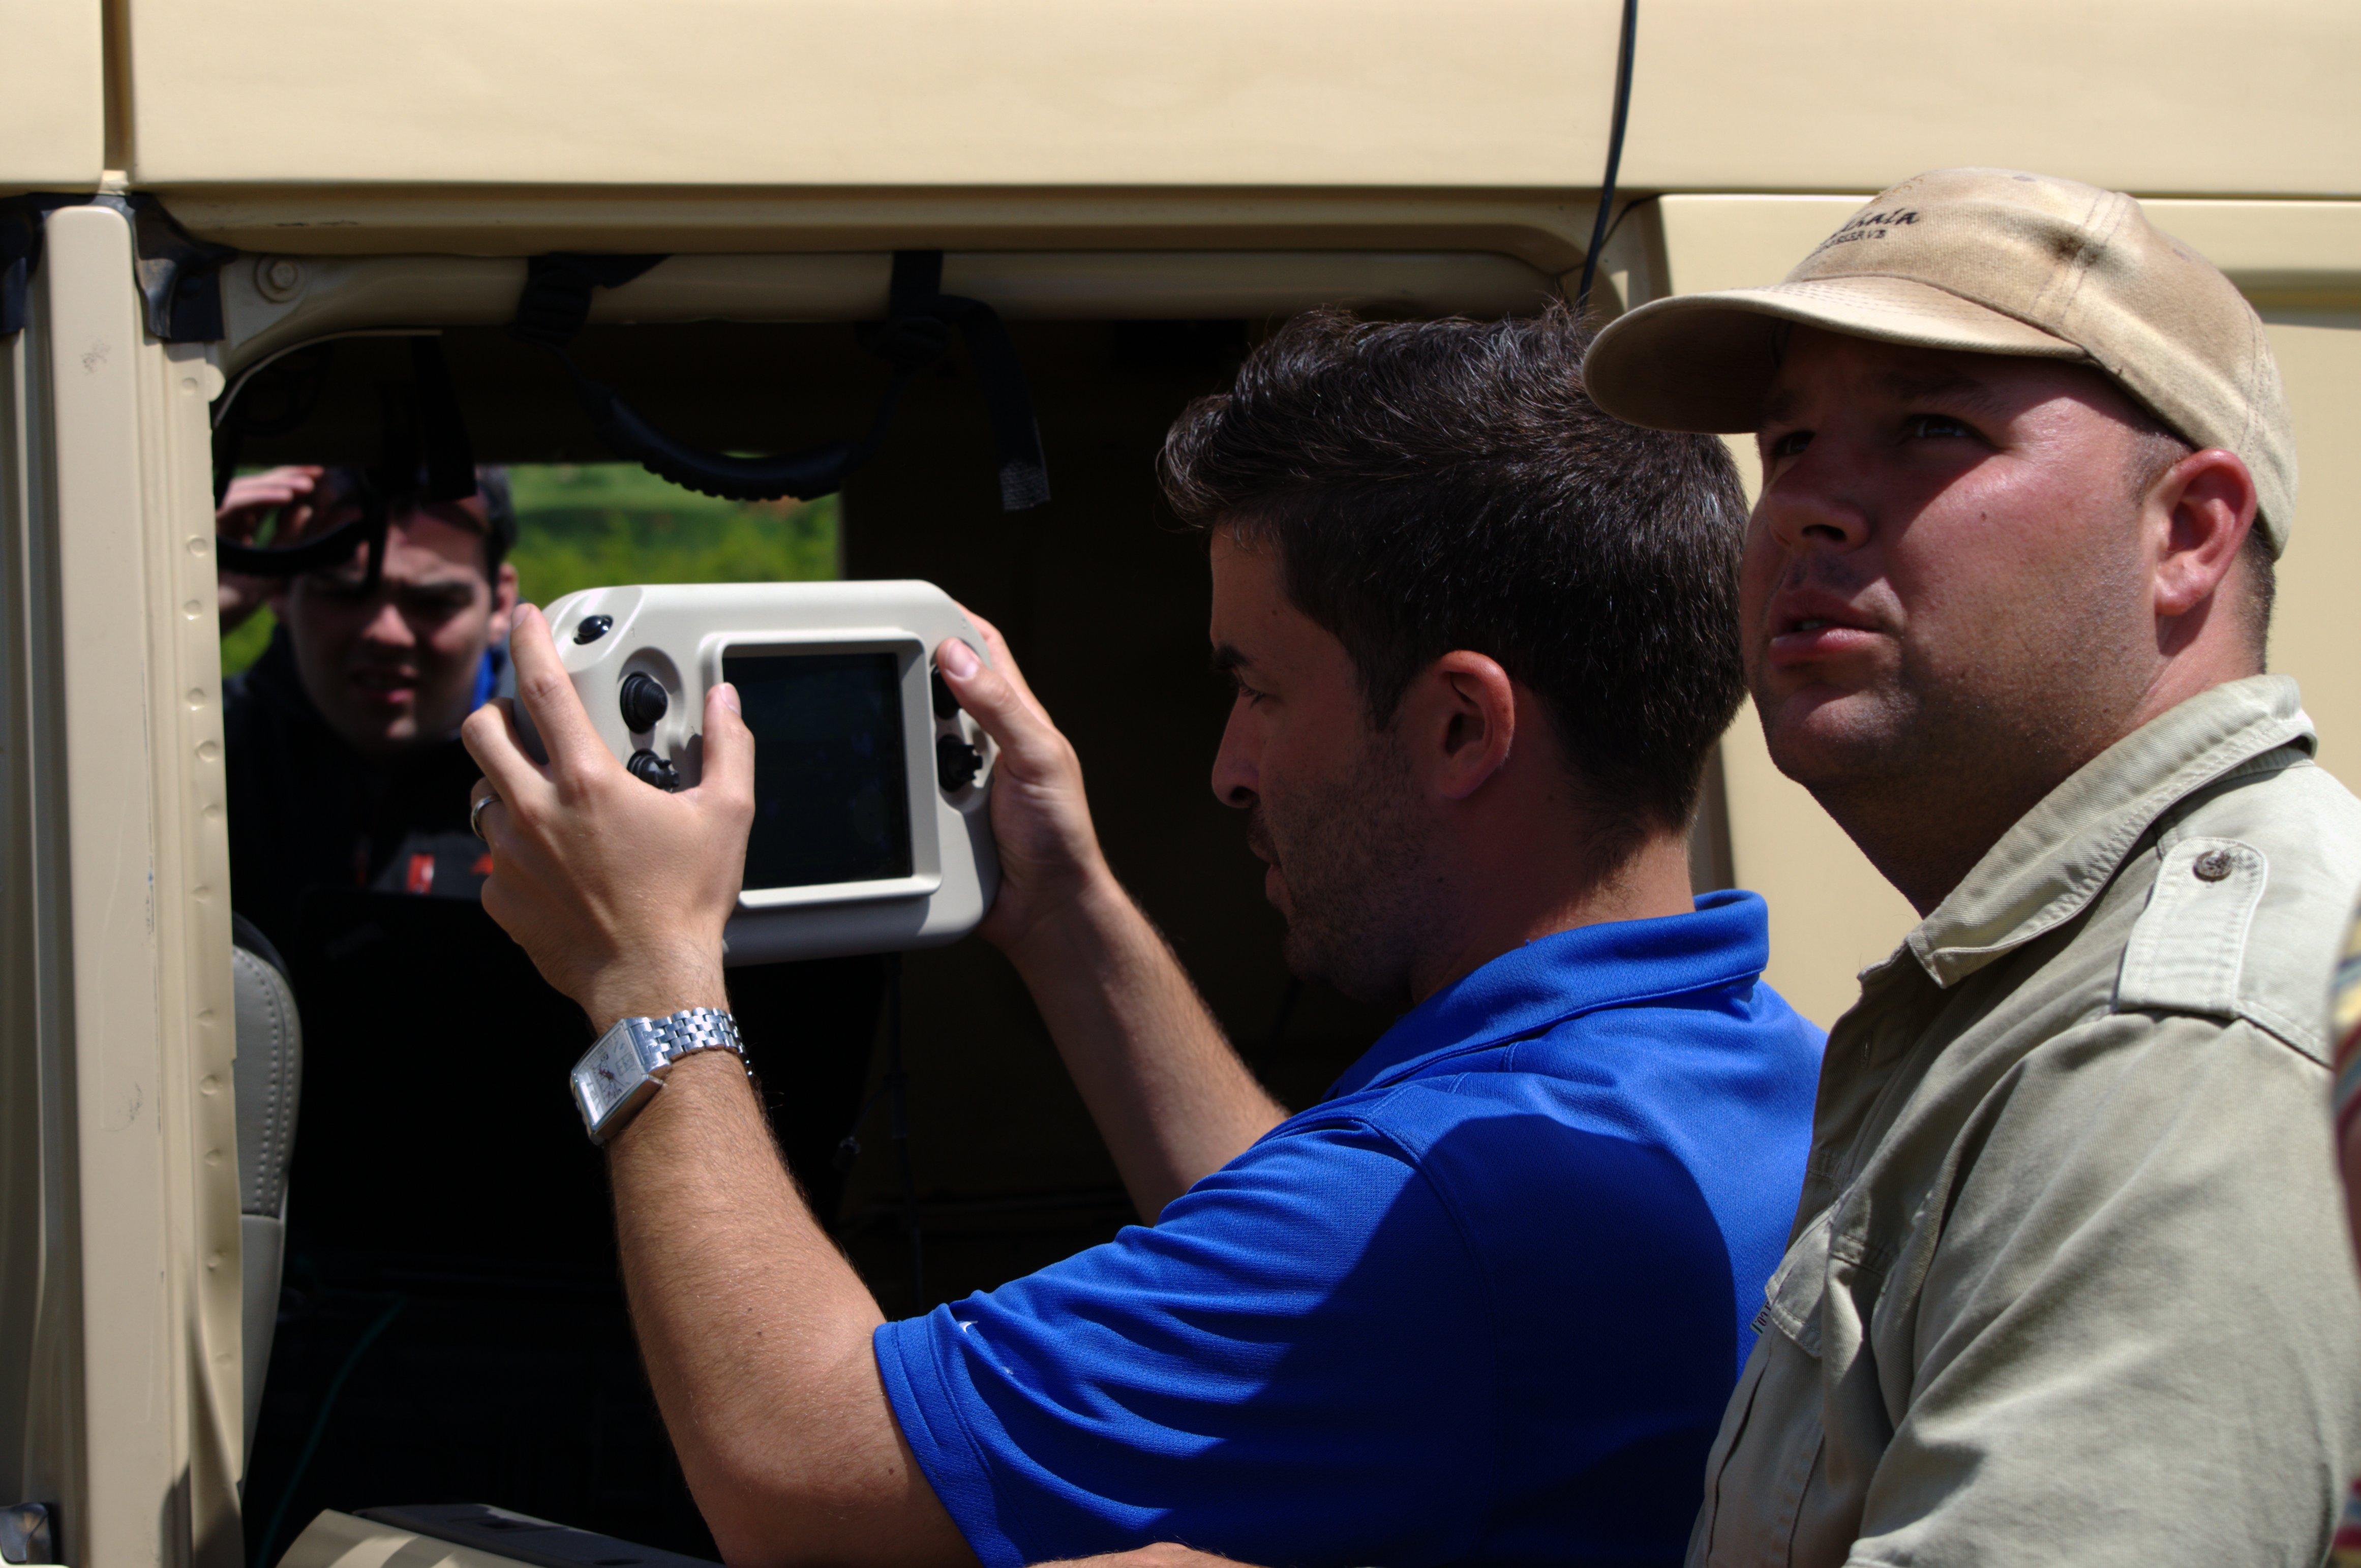 A ranger at Amakhala Game Reserve observes UAV flight